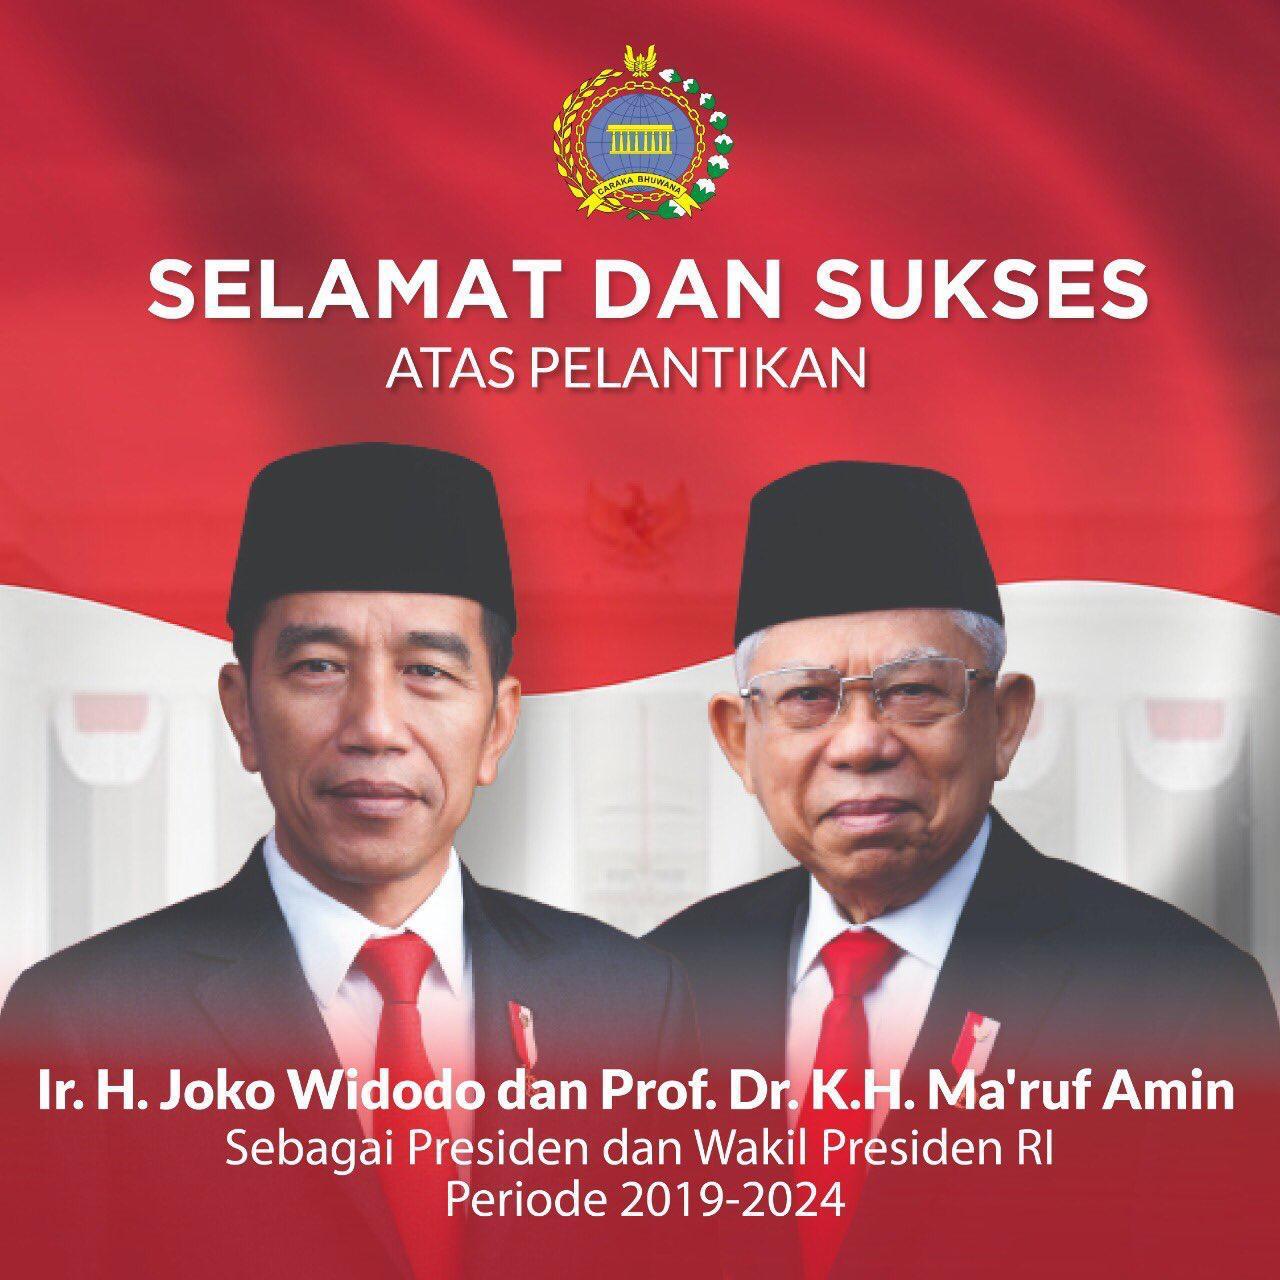 Perdana Menteri Singapura Hadiri Pelantikan Presiden Joko Widodo Dan Wakil Presiden Kh Ma Ruf Amin Bersamaindonesiamaju